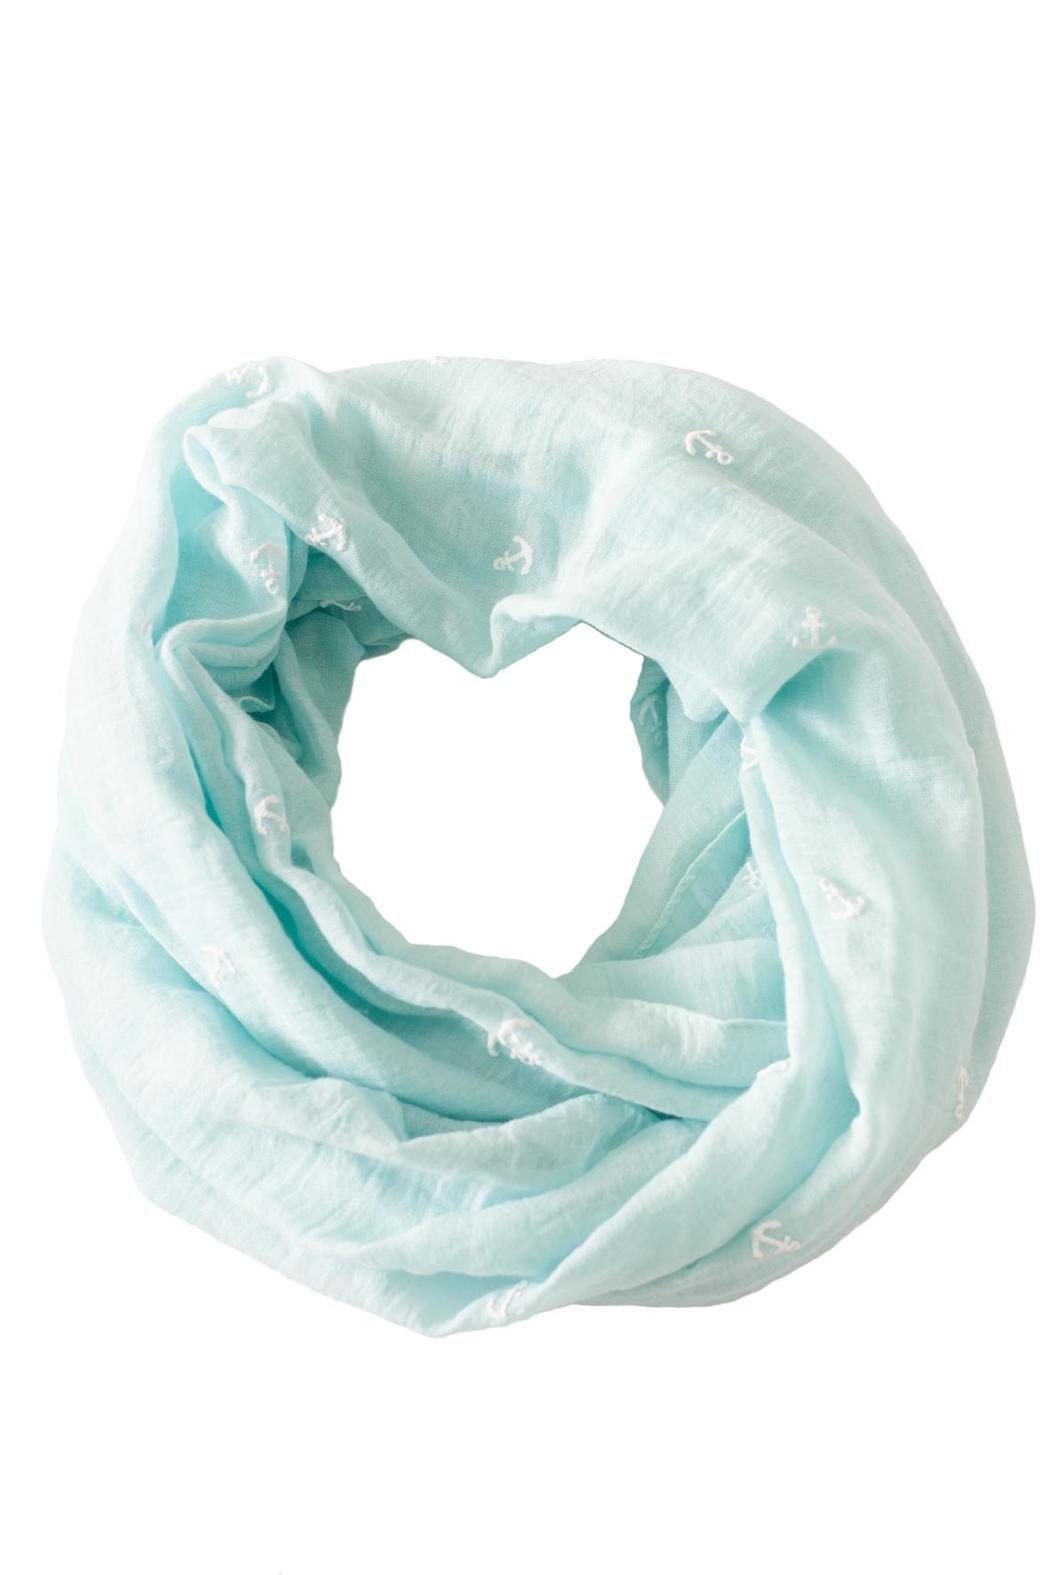 "Mint infinity scarf with raised white anchor print.    Measures: 28"" x 36"".   Anchor Infinity Scarf by Love of Fashion. Accessories - Scarves & Wraps Philadelphia, Pennsylvania"